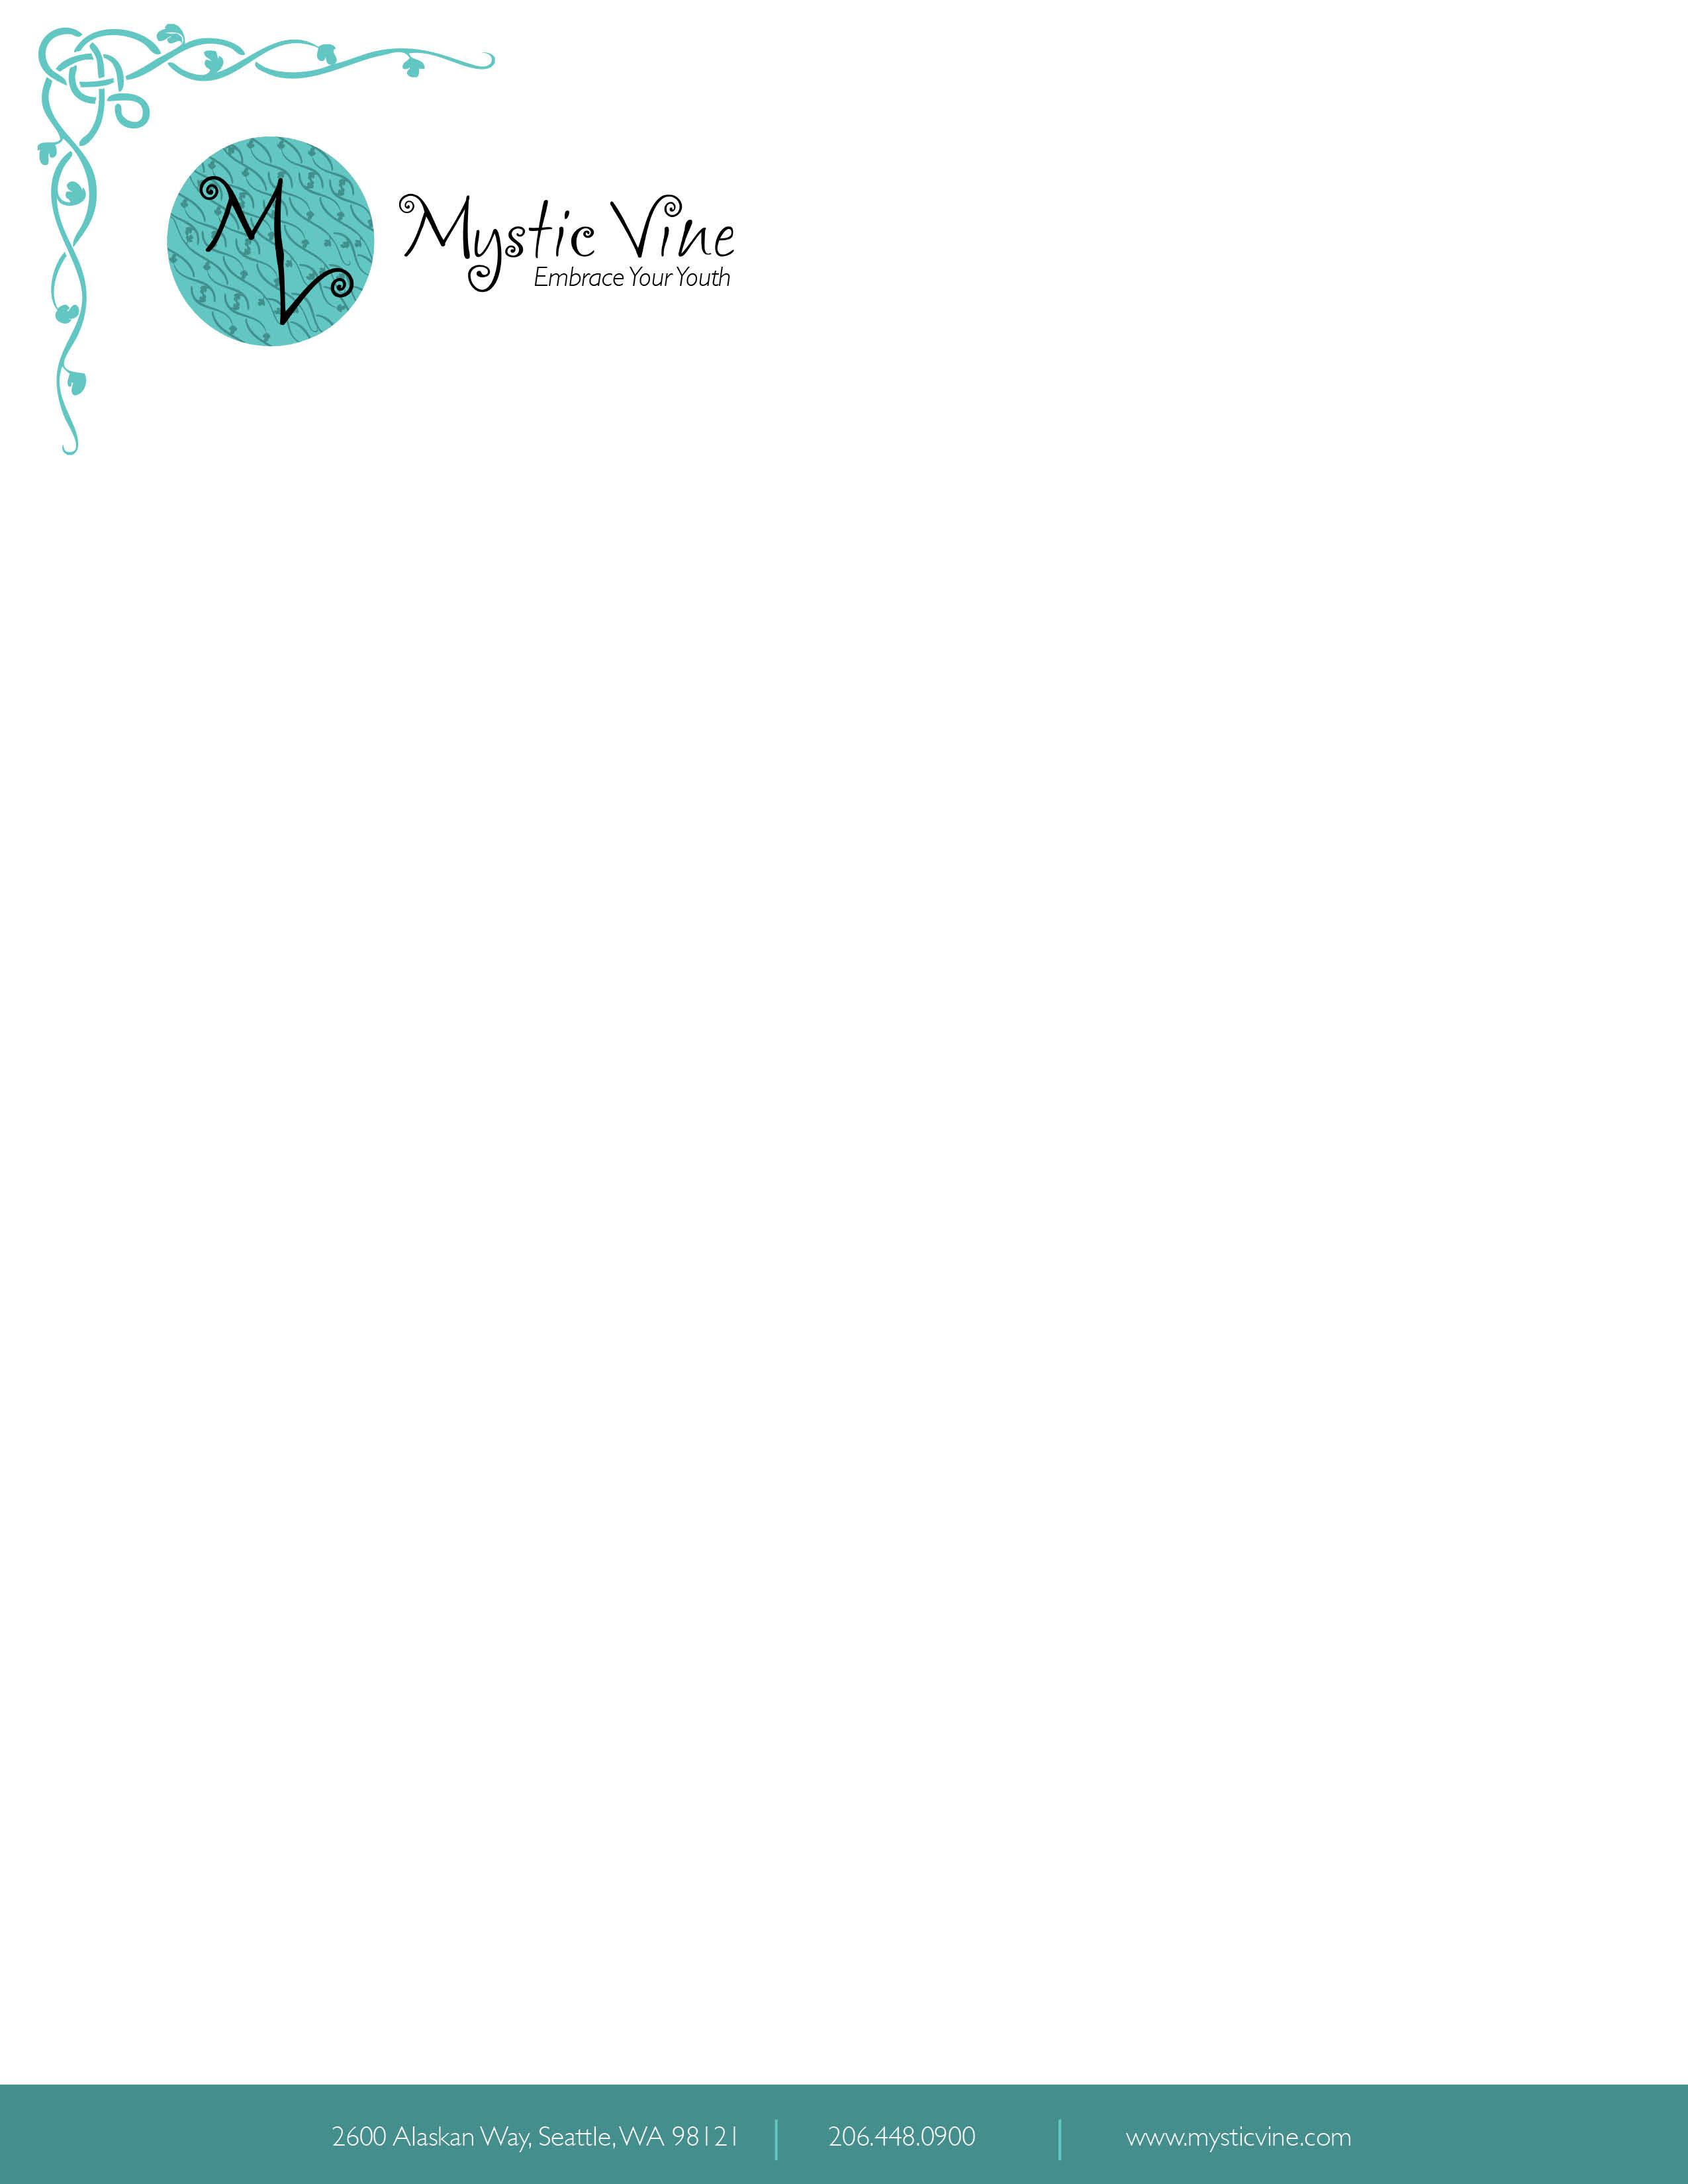 letterhead for company